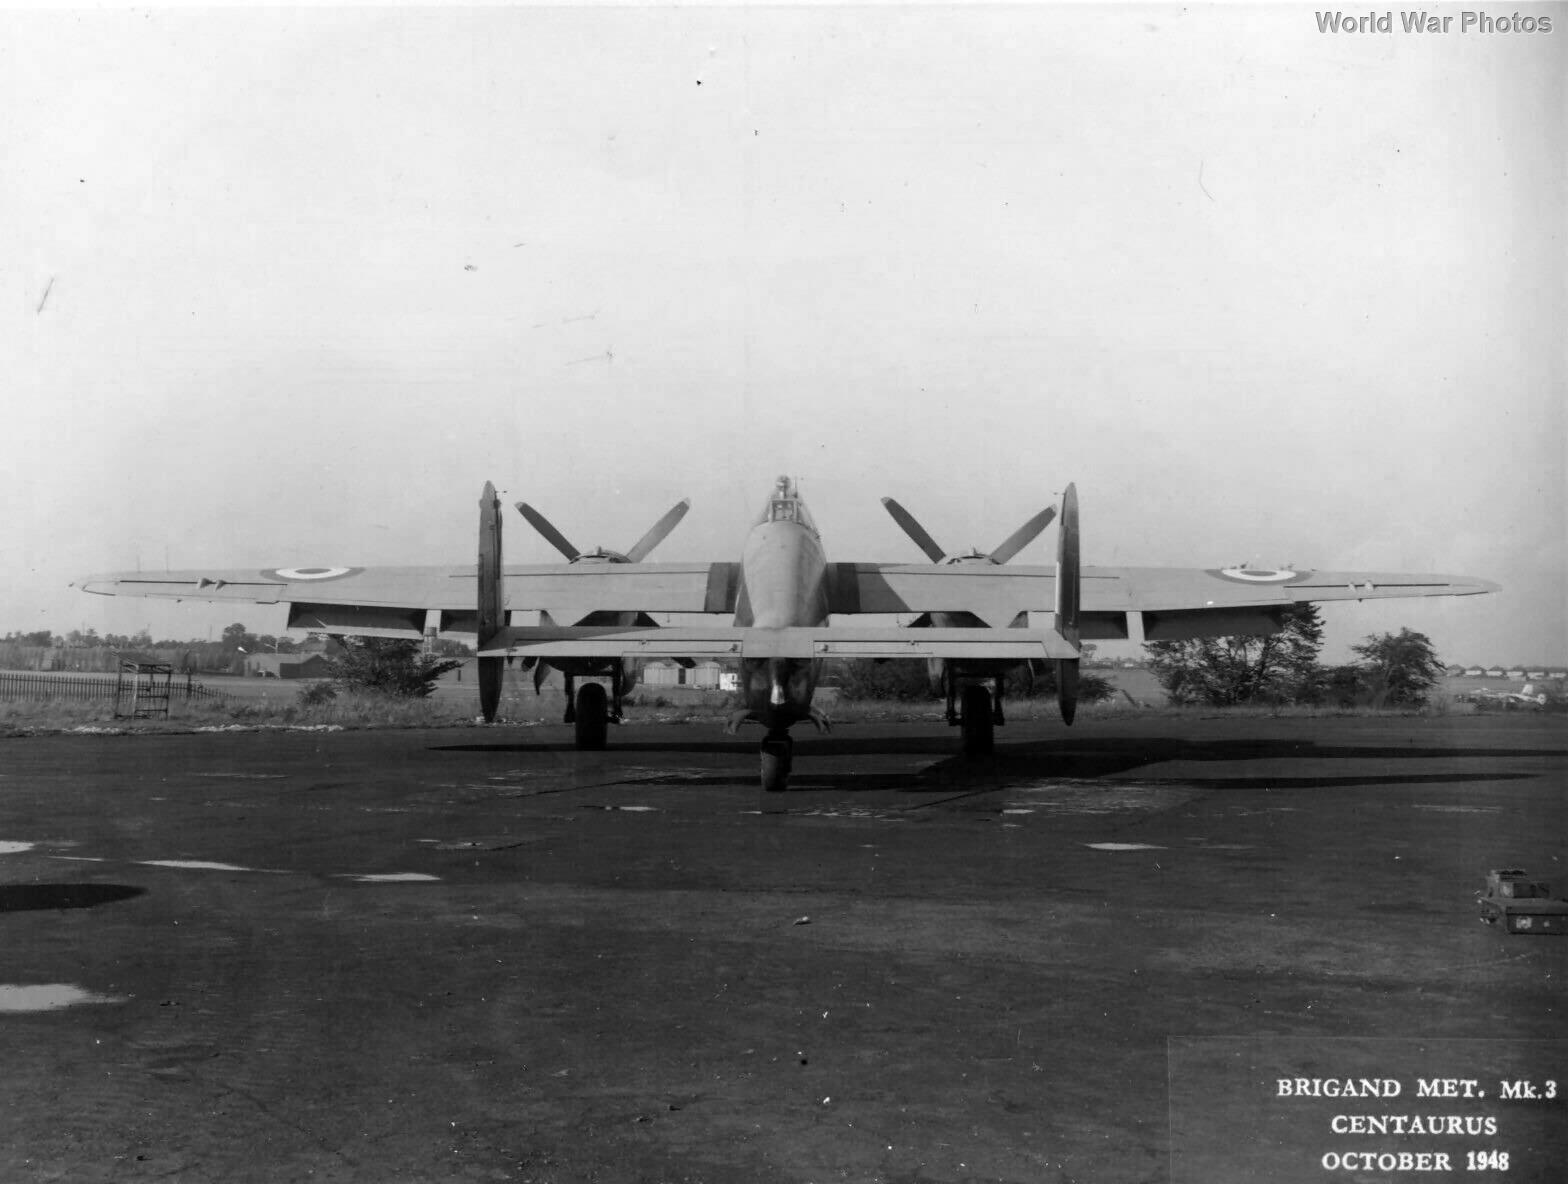 Bristol Brigand Met Mk 3, October 1948